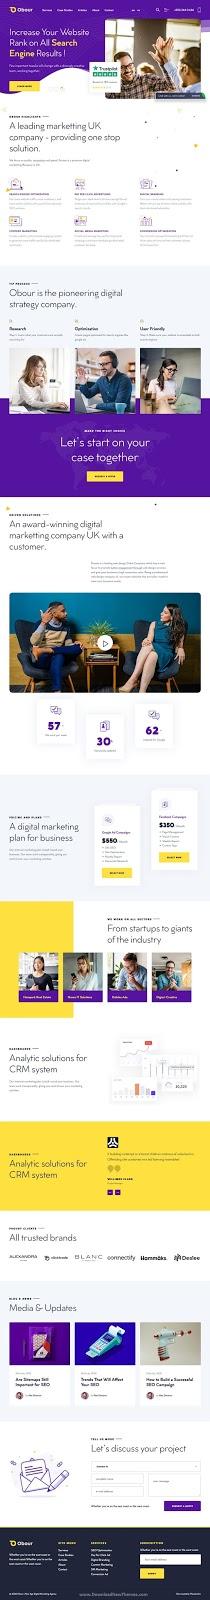 Premium Digital Marketing Agency WordPress Theme